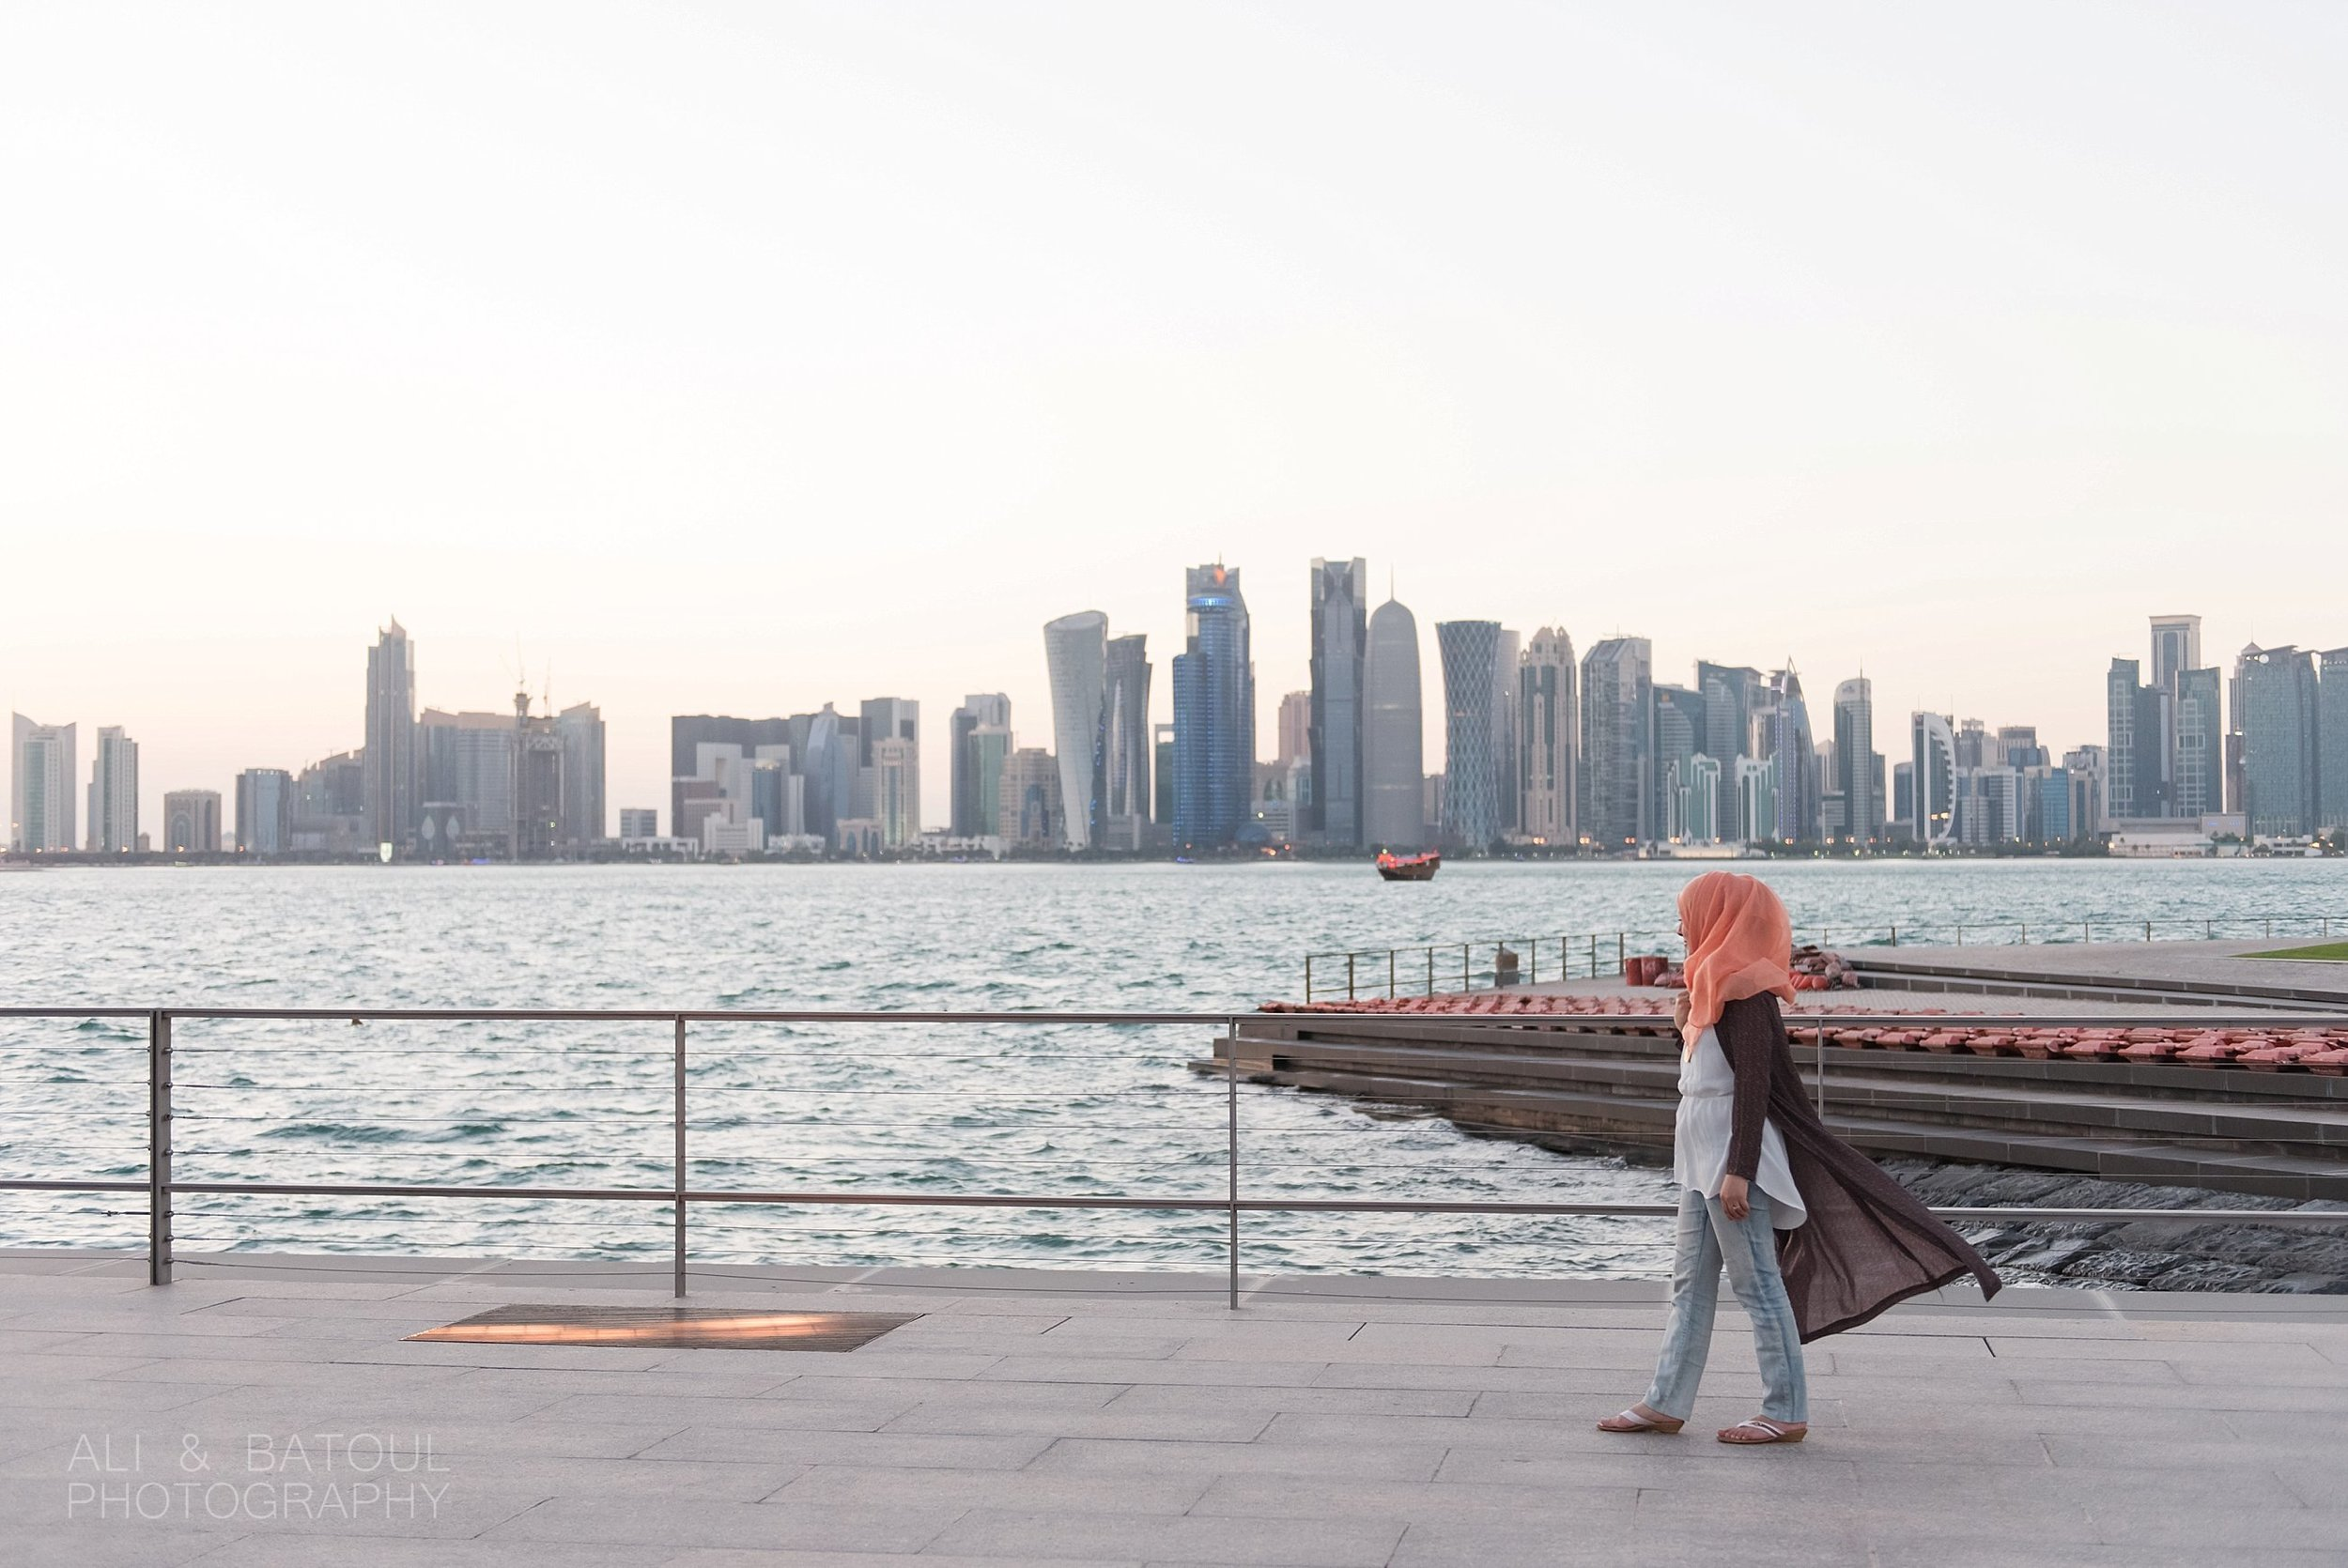 Ali & Batoul Photography - Doha Travel Photography_0048.jpg